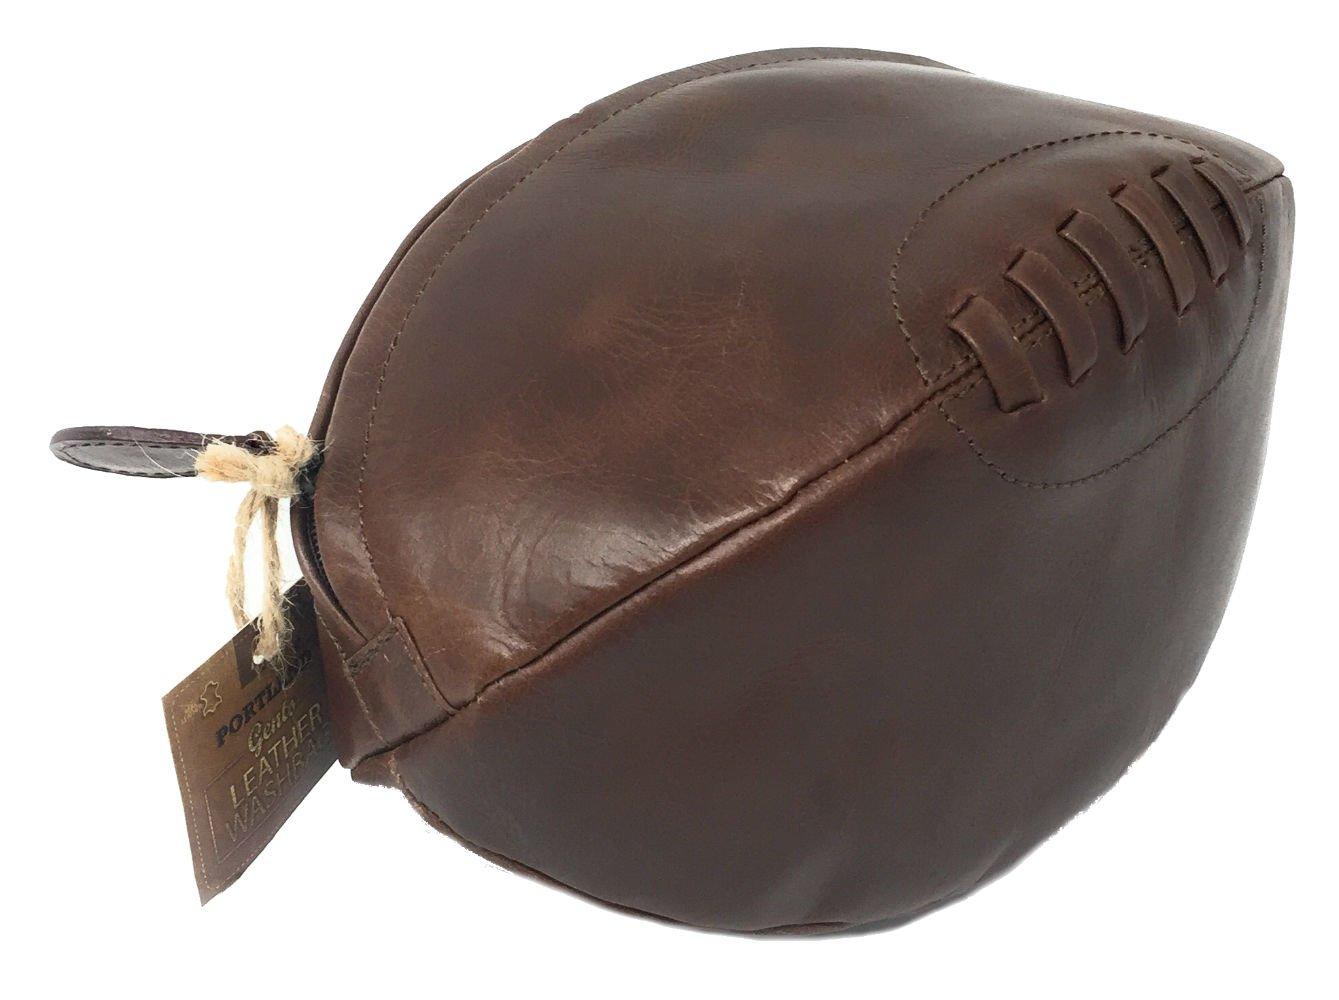 1e09a6bd6 Bolso Neceser de Cuero con Forma de Balón de Rugby: Amazon.es: Equipaje